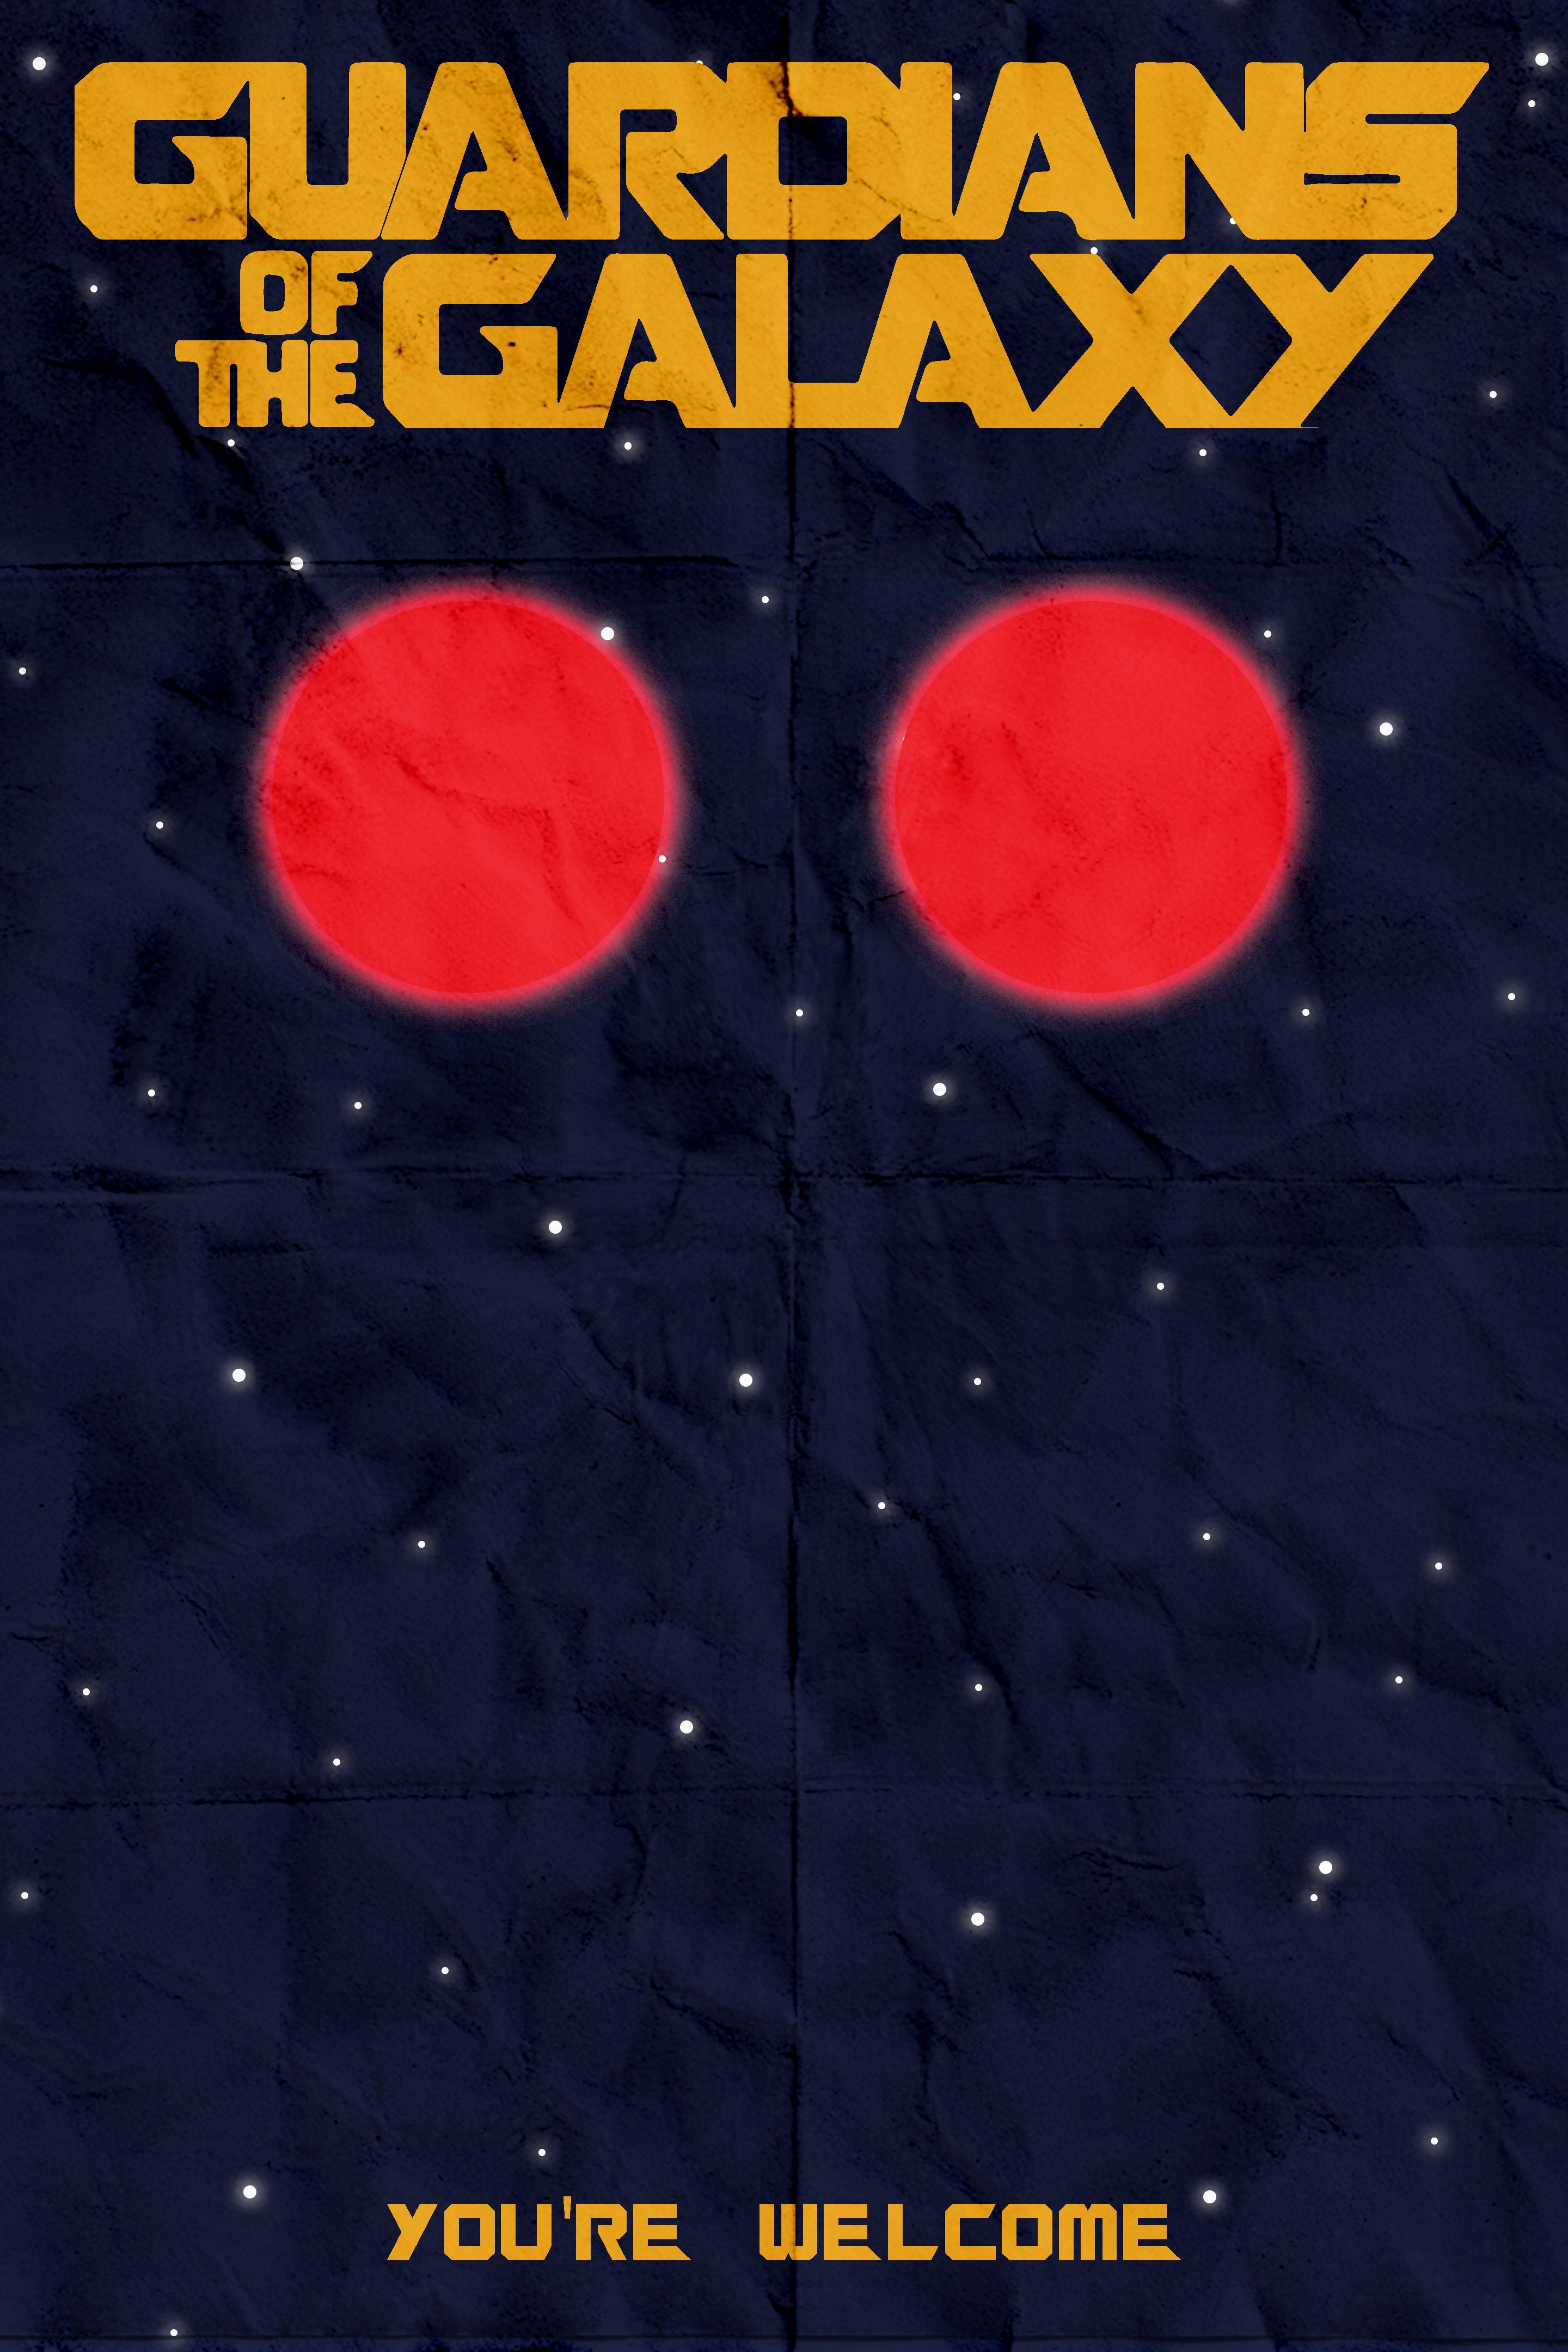 Guardieans Poster